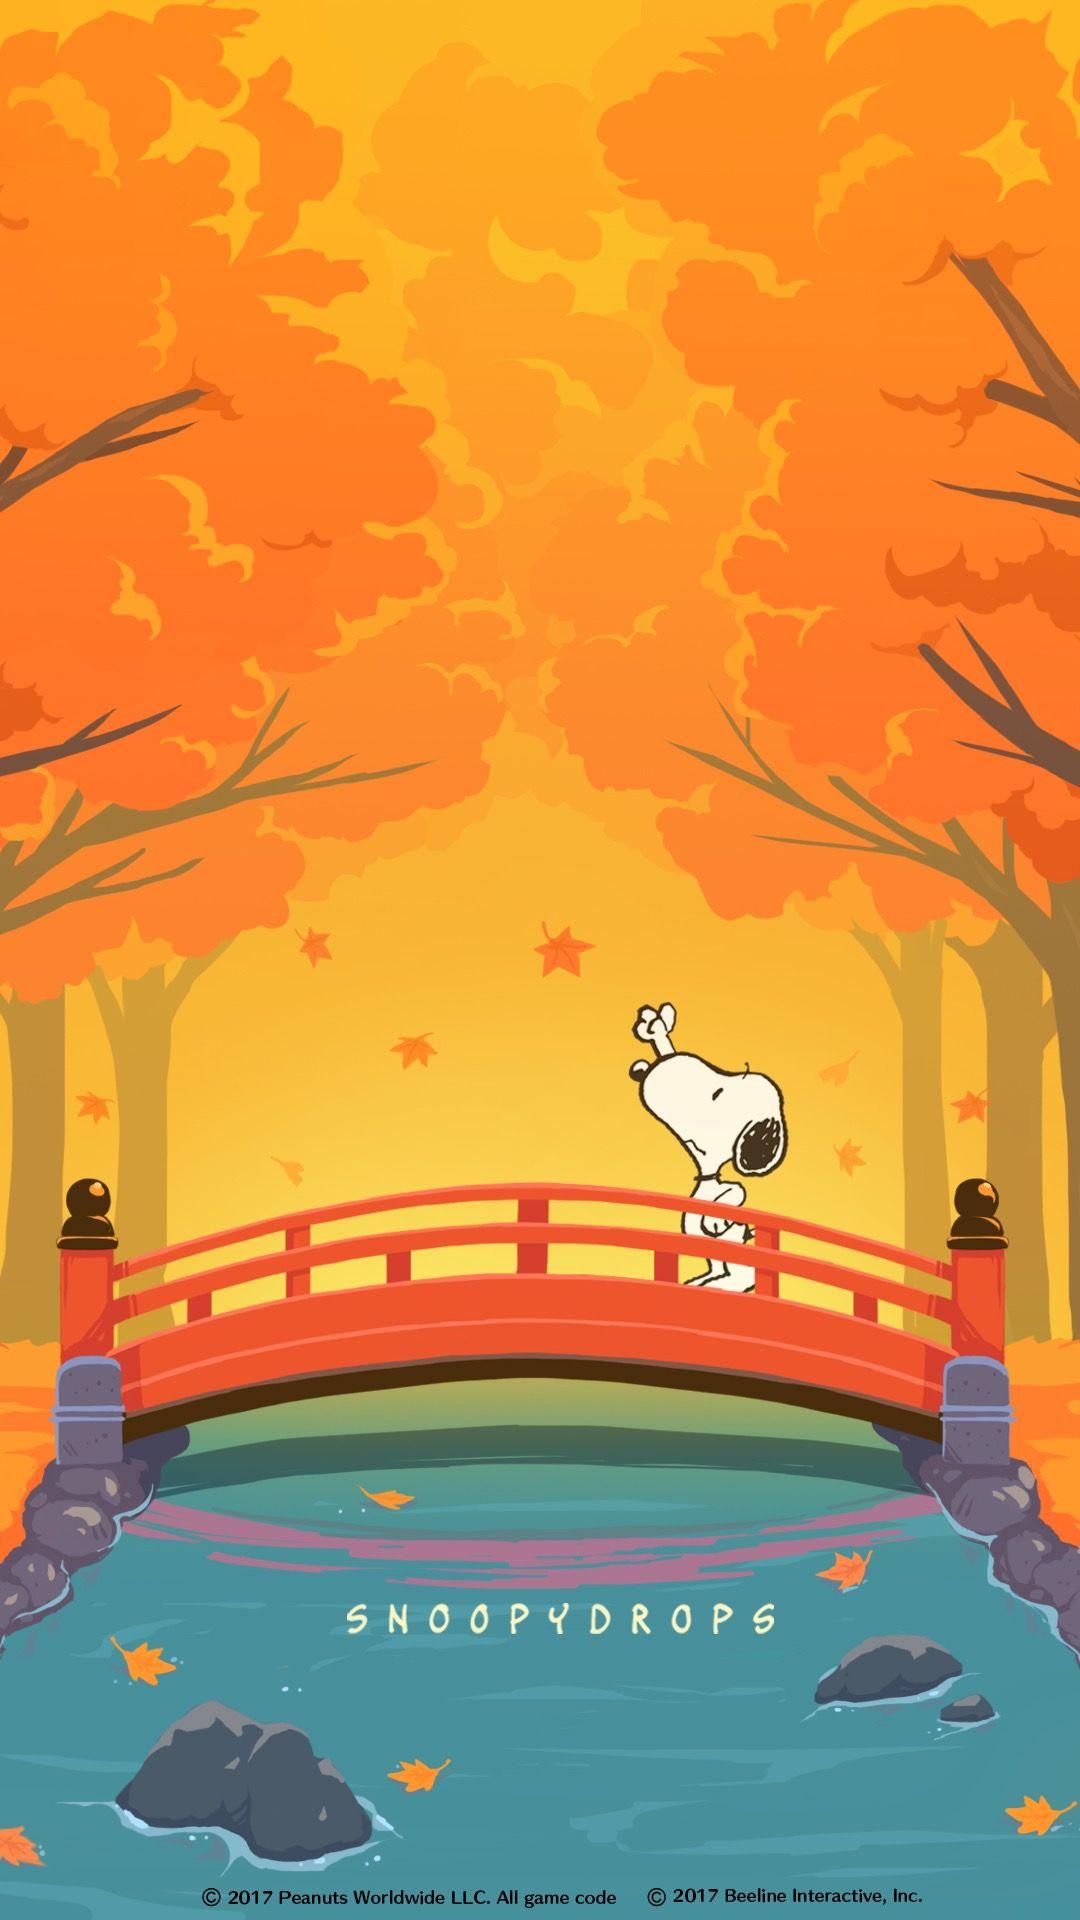 Snoopy Wallpaper Iphone 6 Snoopy スヌーピー(もみじ) スヌーピーの壁紙、スヌーピー イラスト、秋 壁紙